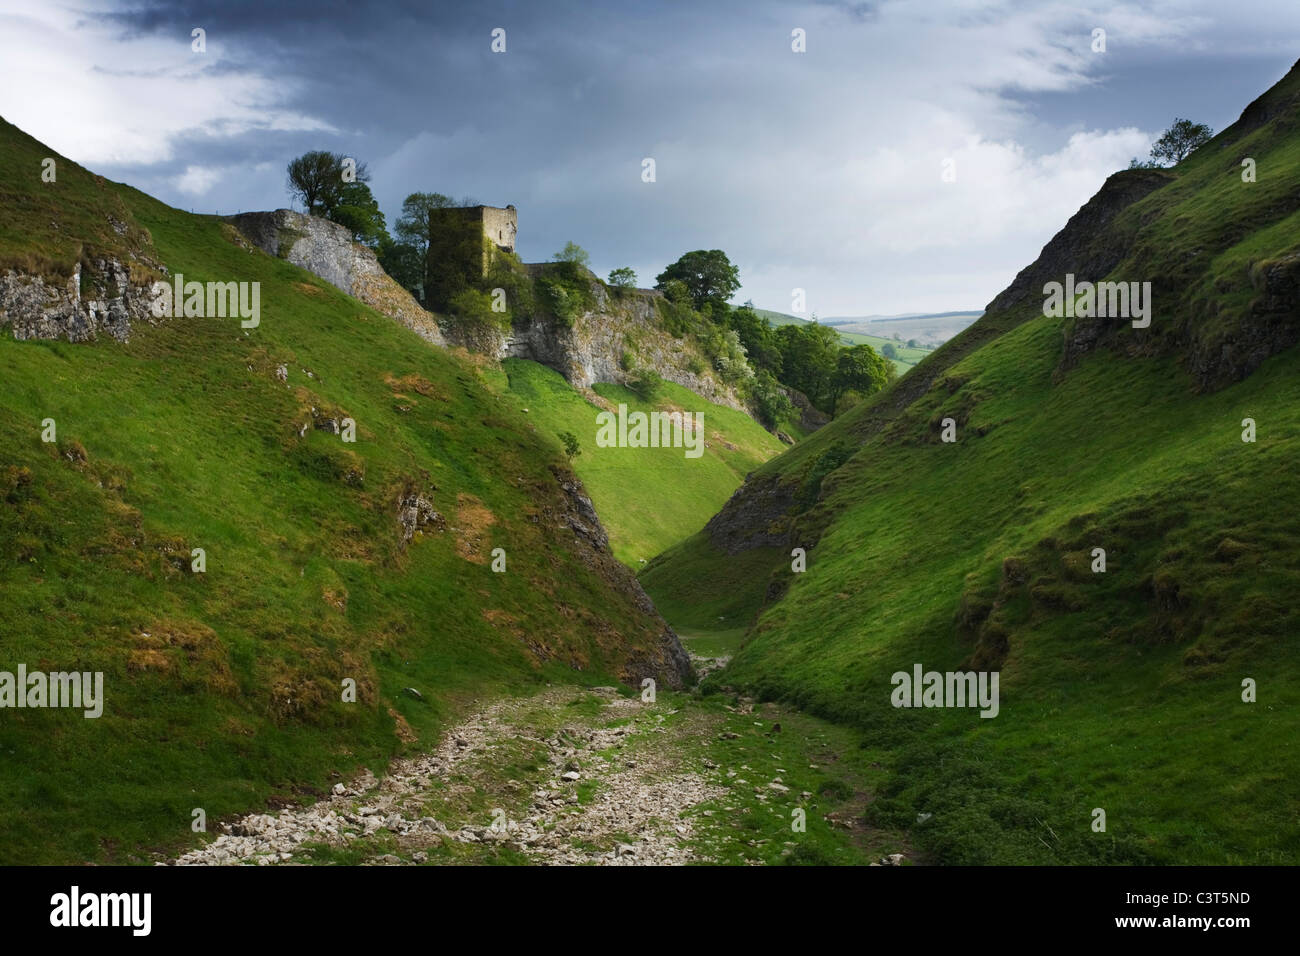 Cave Dale and Peveril Castle, Castleton. Peak District National Park. Derbyshire. England. UK. Stock Photo